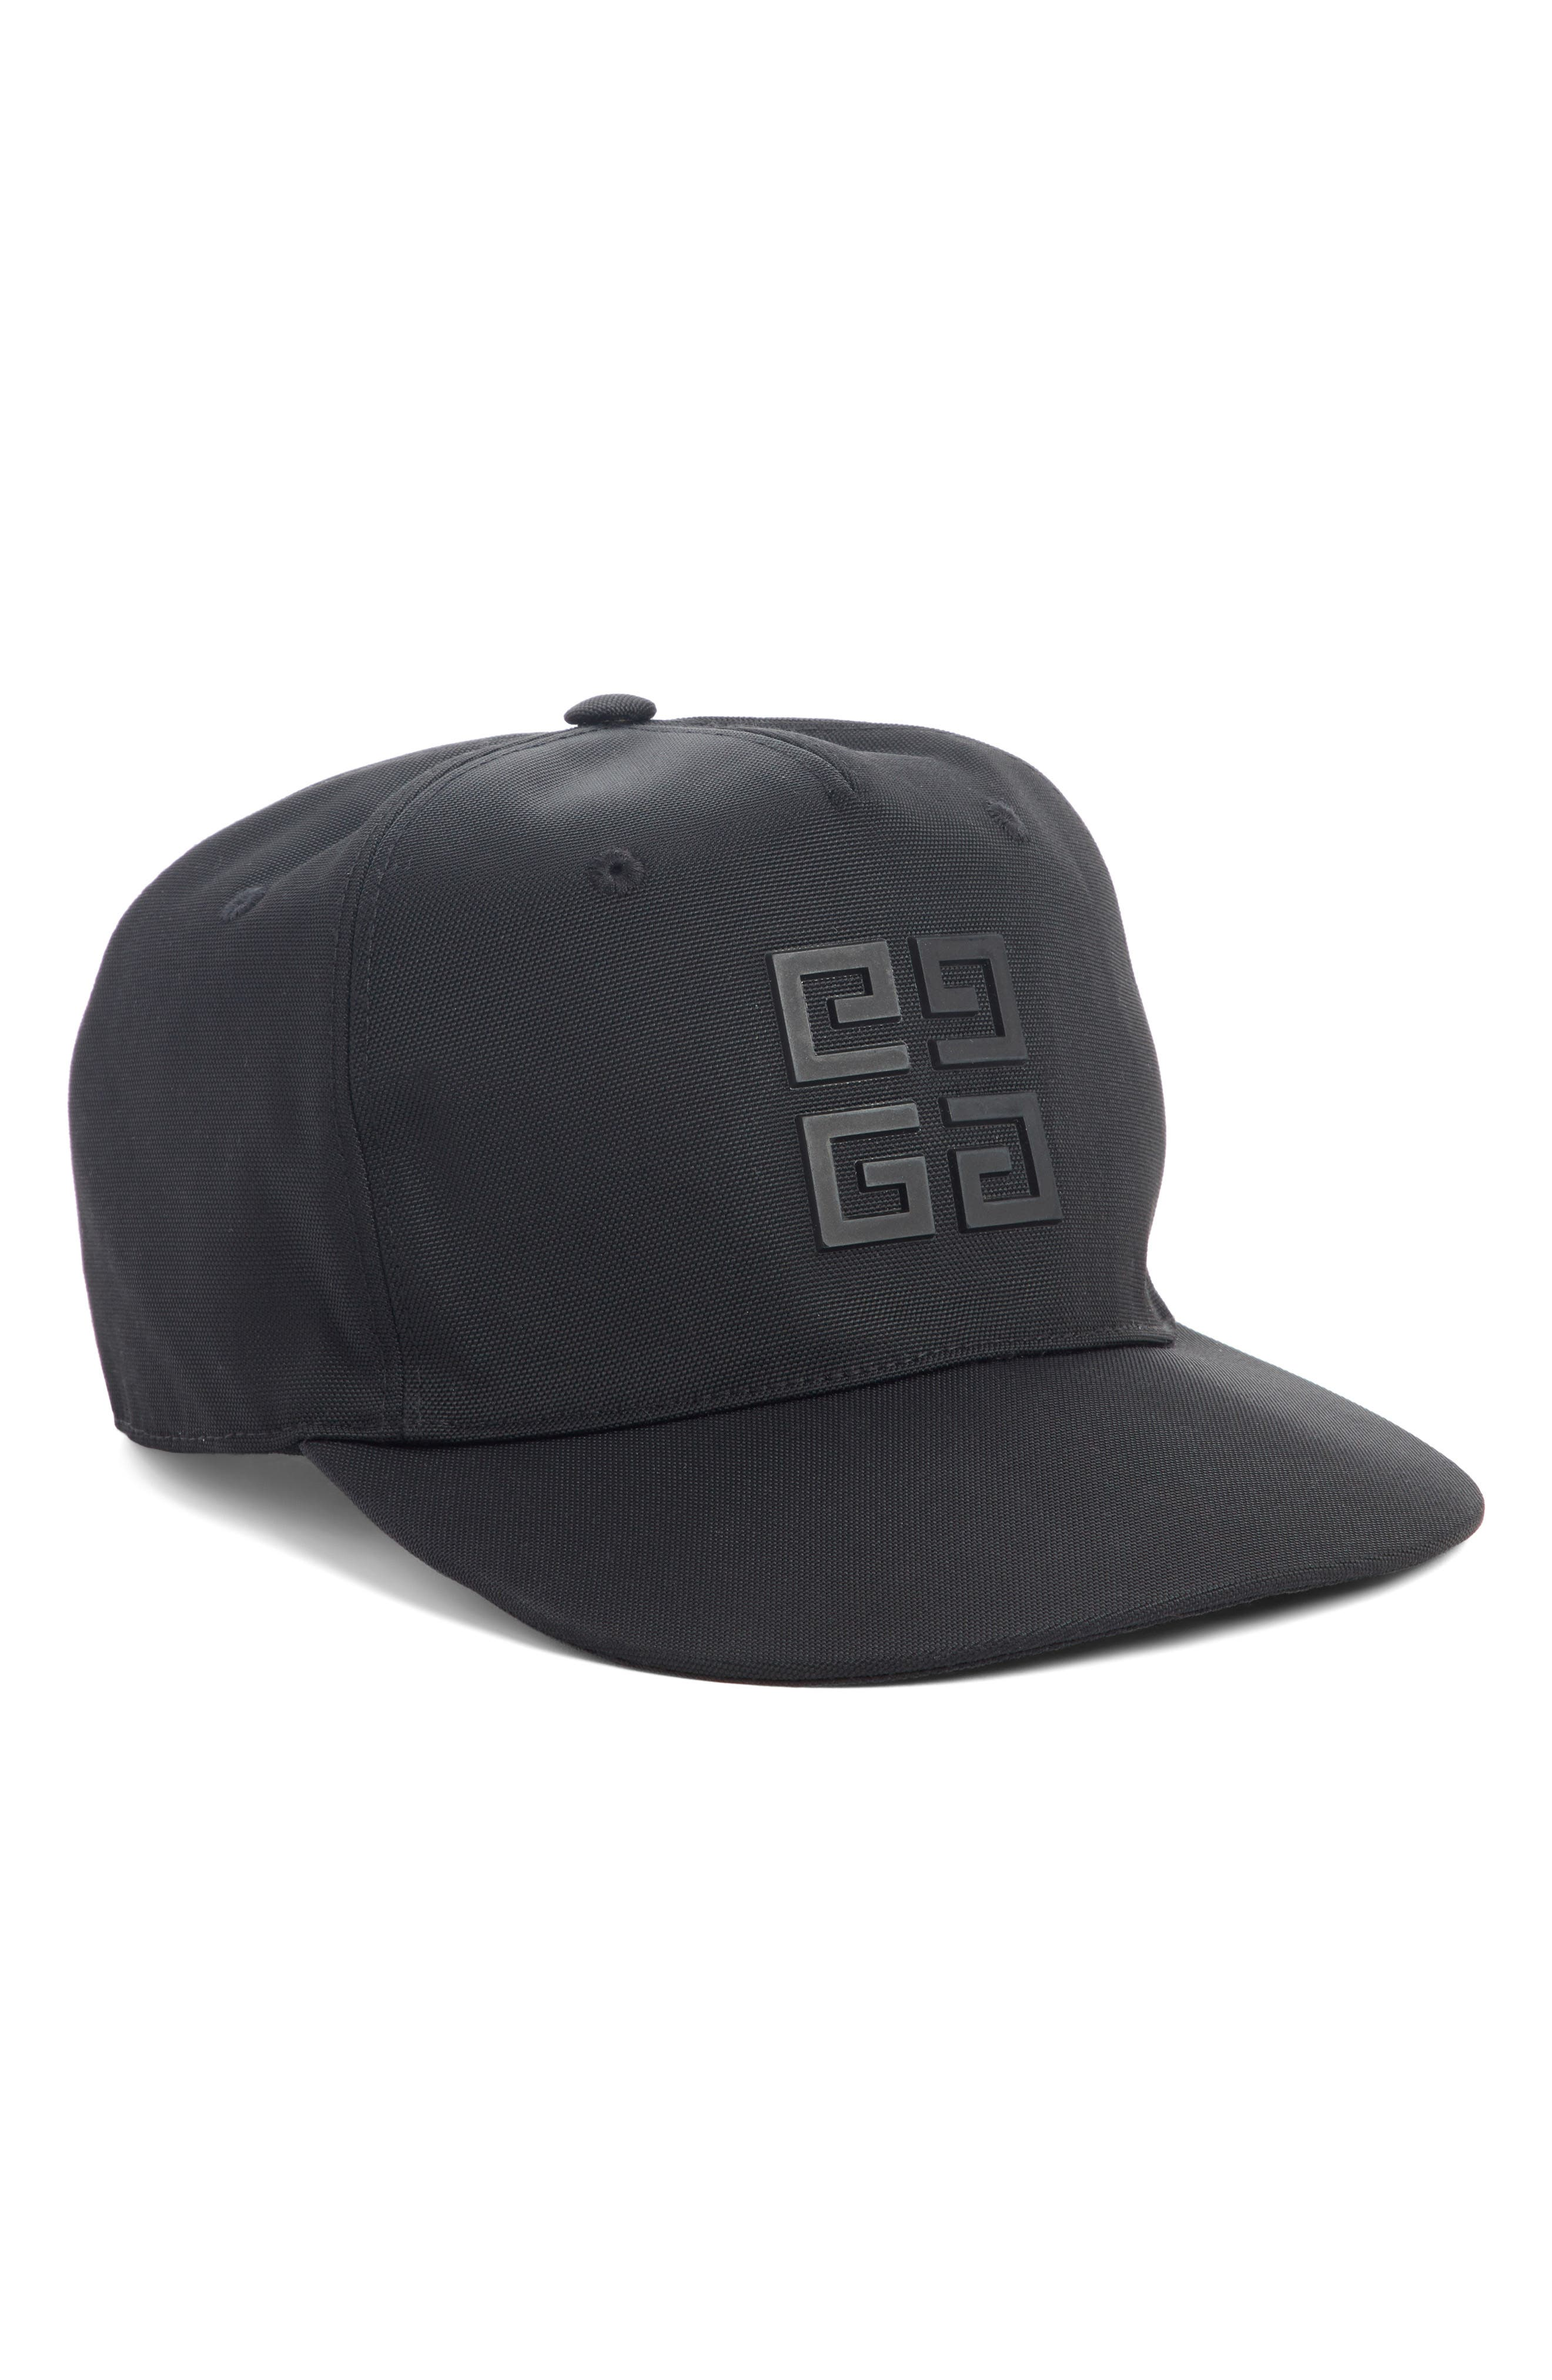 Rubber 4G Logo Cap,                             Main thumbnail 1, color,                             BLACK